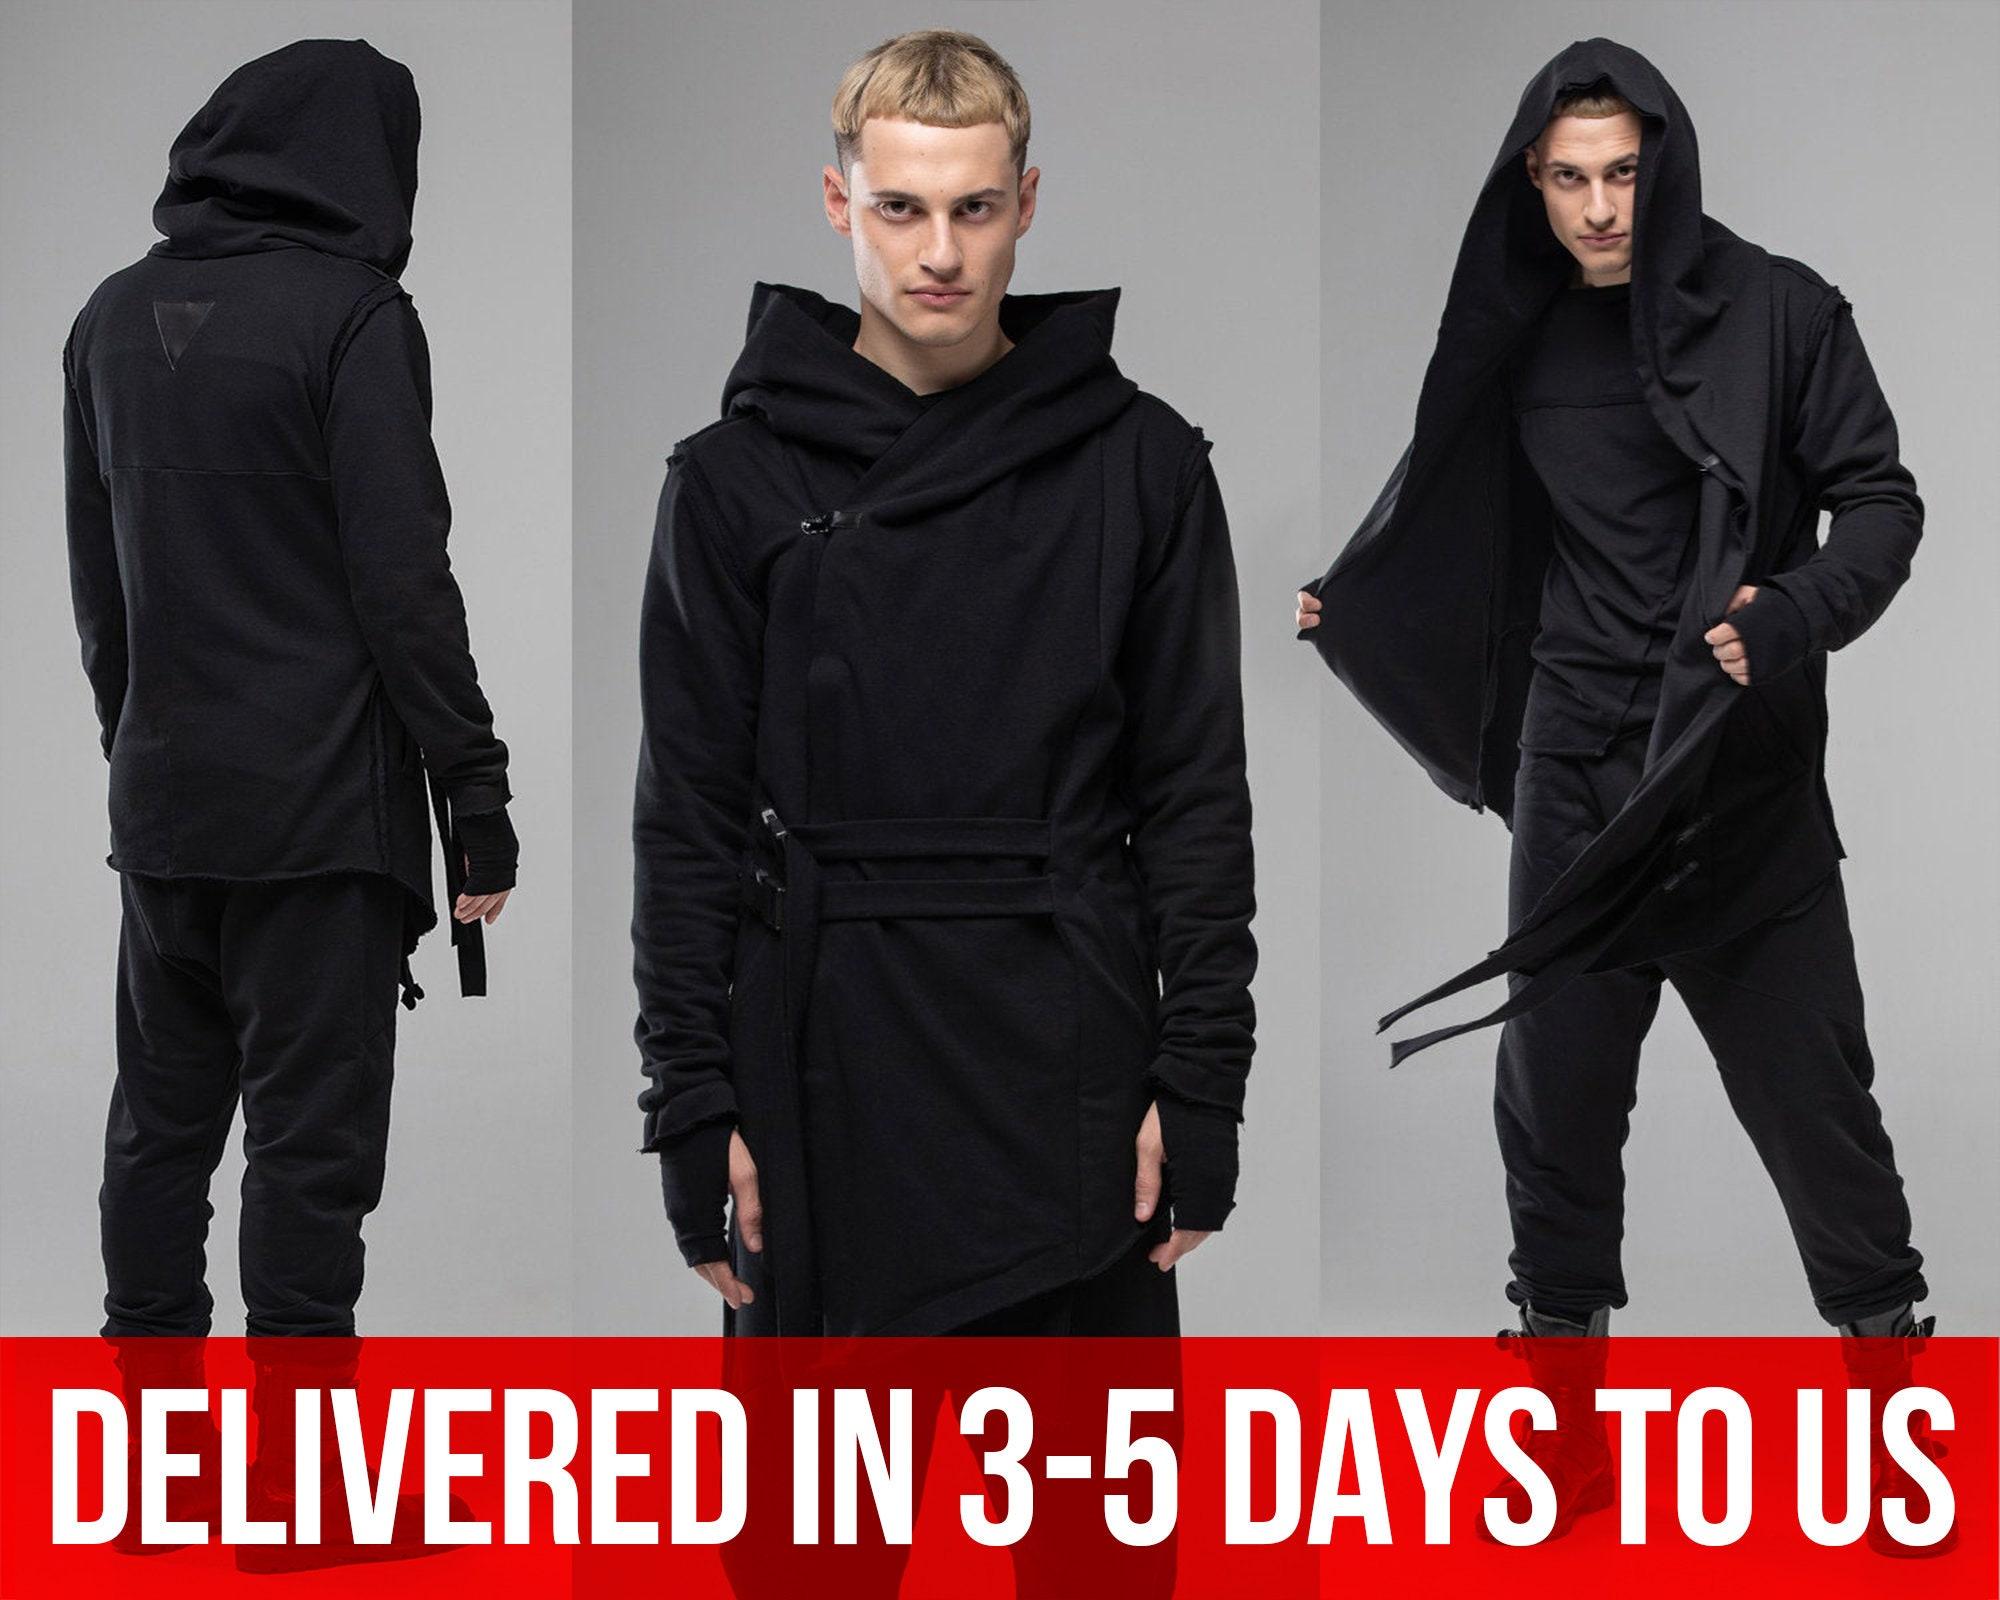 Cyberpunk Clothing Hooded Cloak Sleeveless Asymmetrical Hoodie Coat Black Wool Vest Women